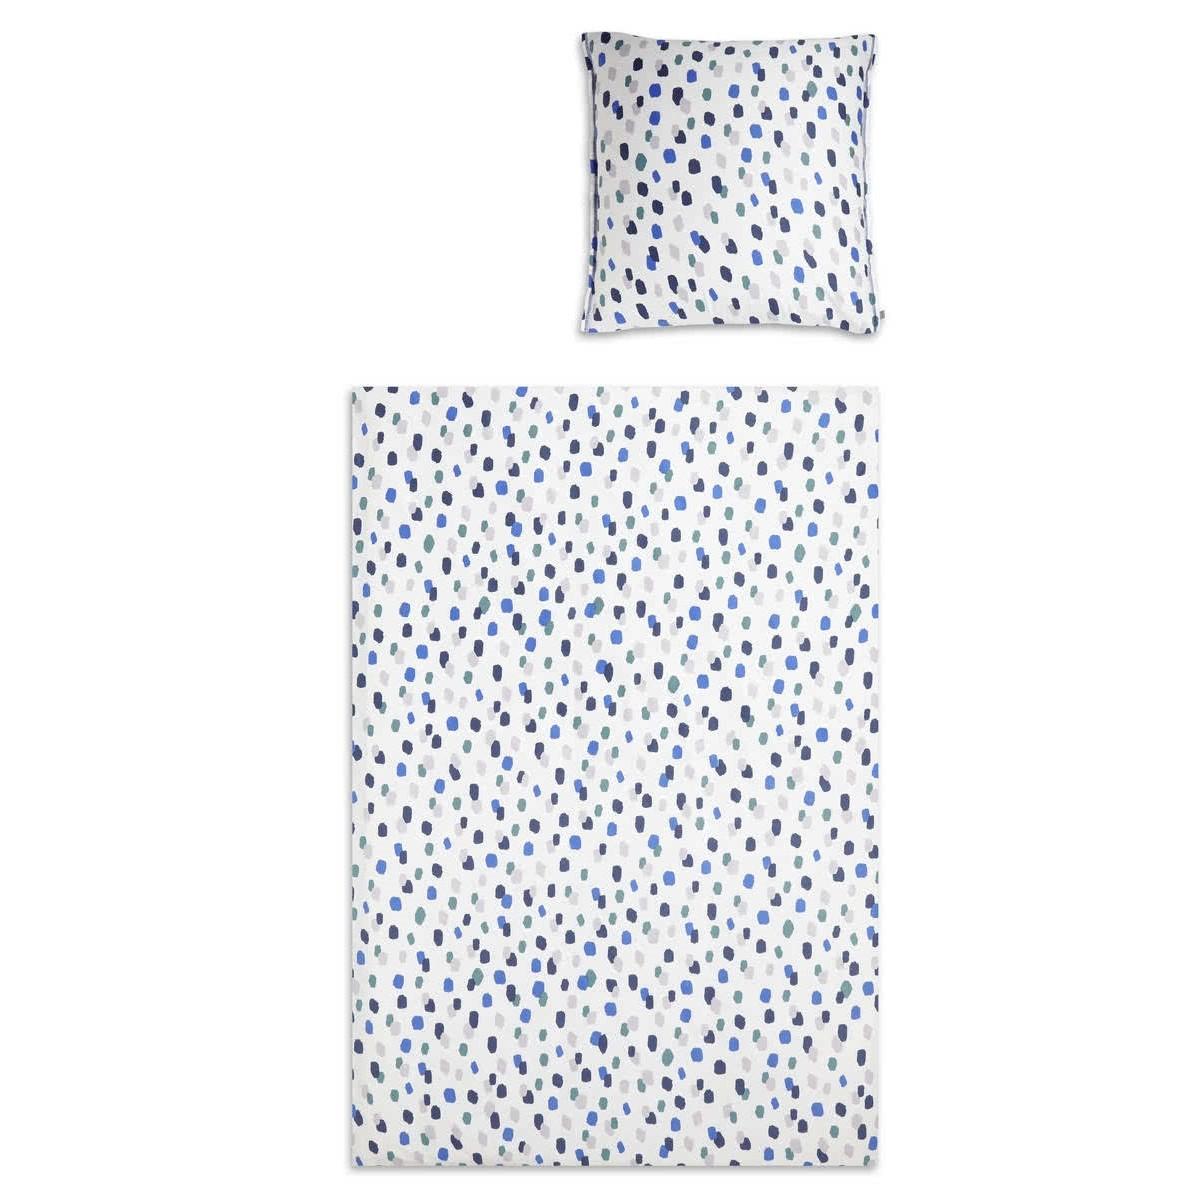 Full Size of Lustige Bettwäsche 155x220 Covered Bettwsche Drops Blue 155 220 Cm Bett Und So T Shirt Sprüche T Shirt Wohnzimmer Lustige Bettwäsche 155x220